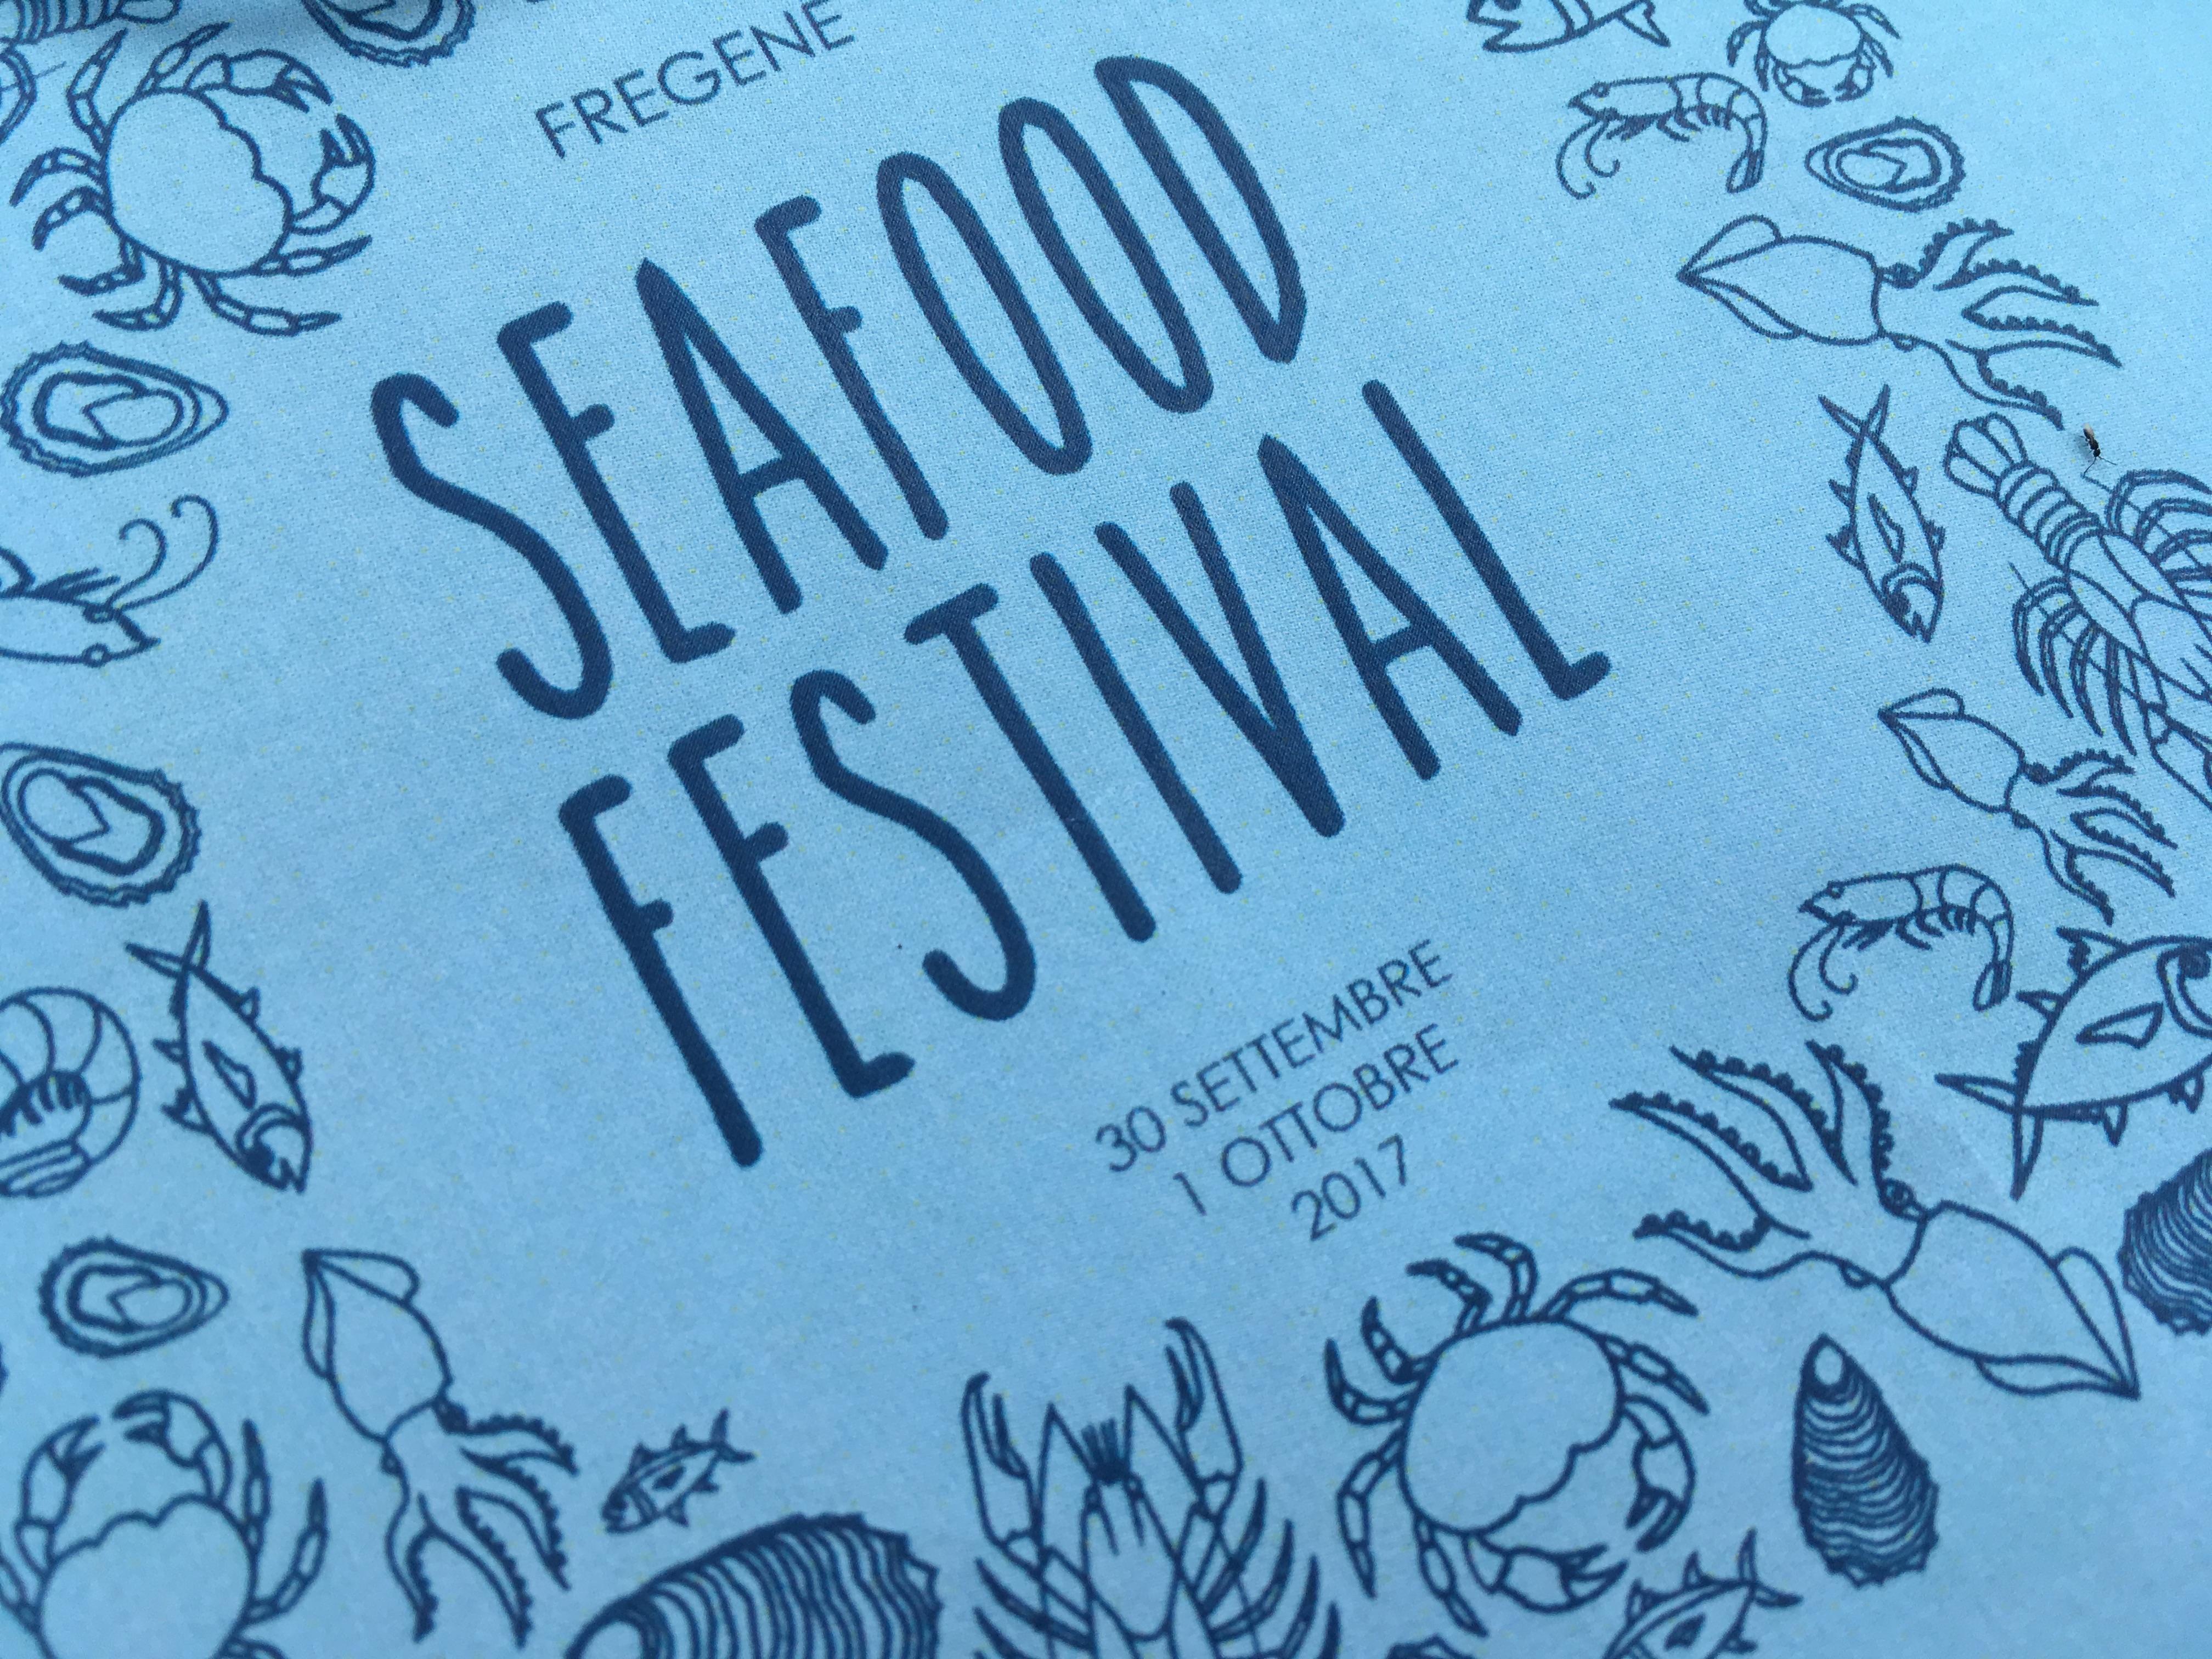 SeaFood Festival al Gilda on The Beach di Fregene